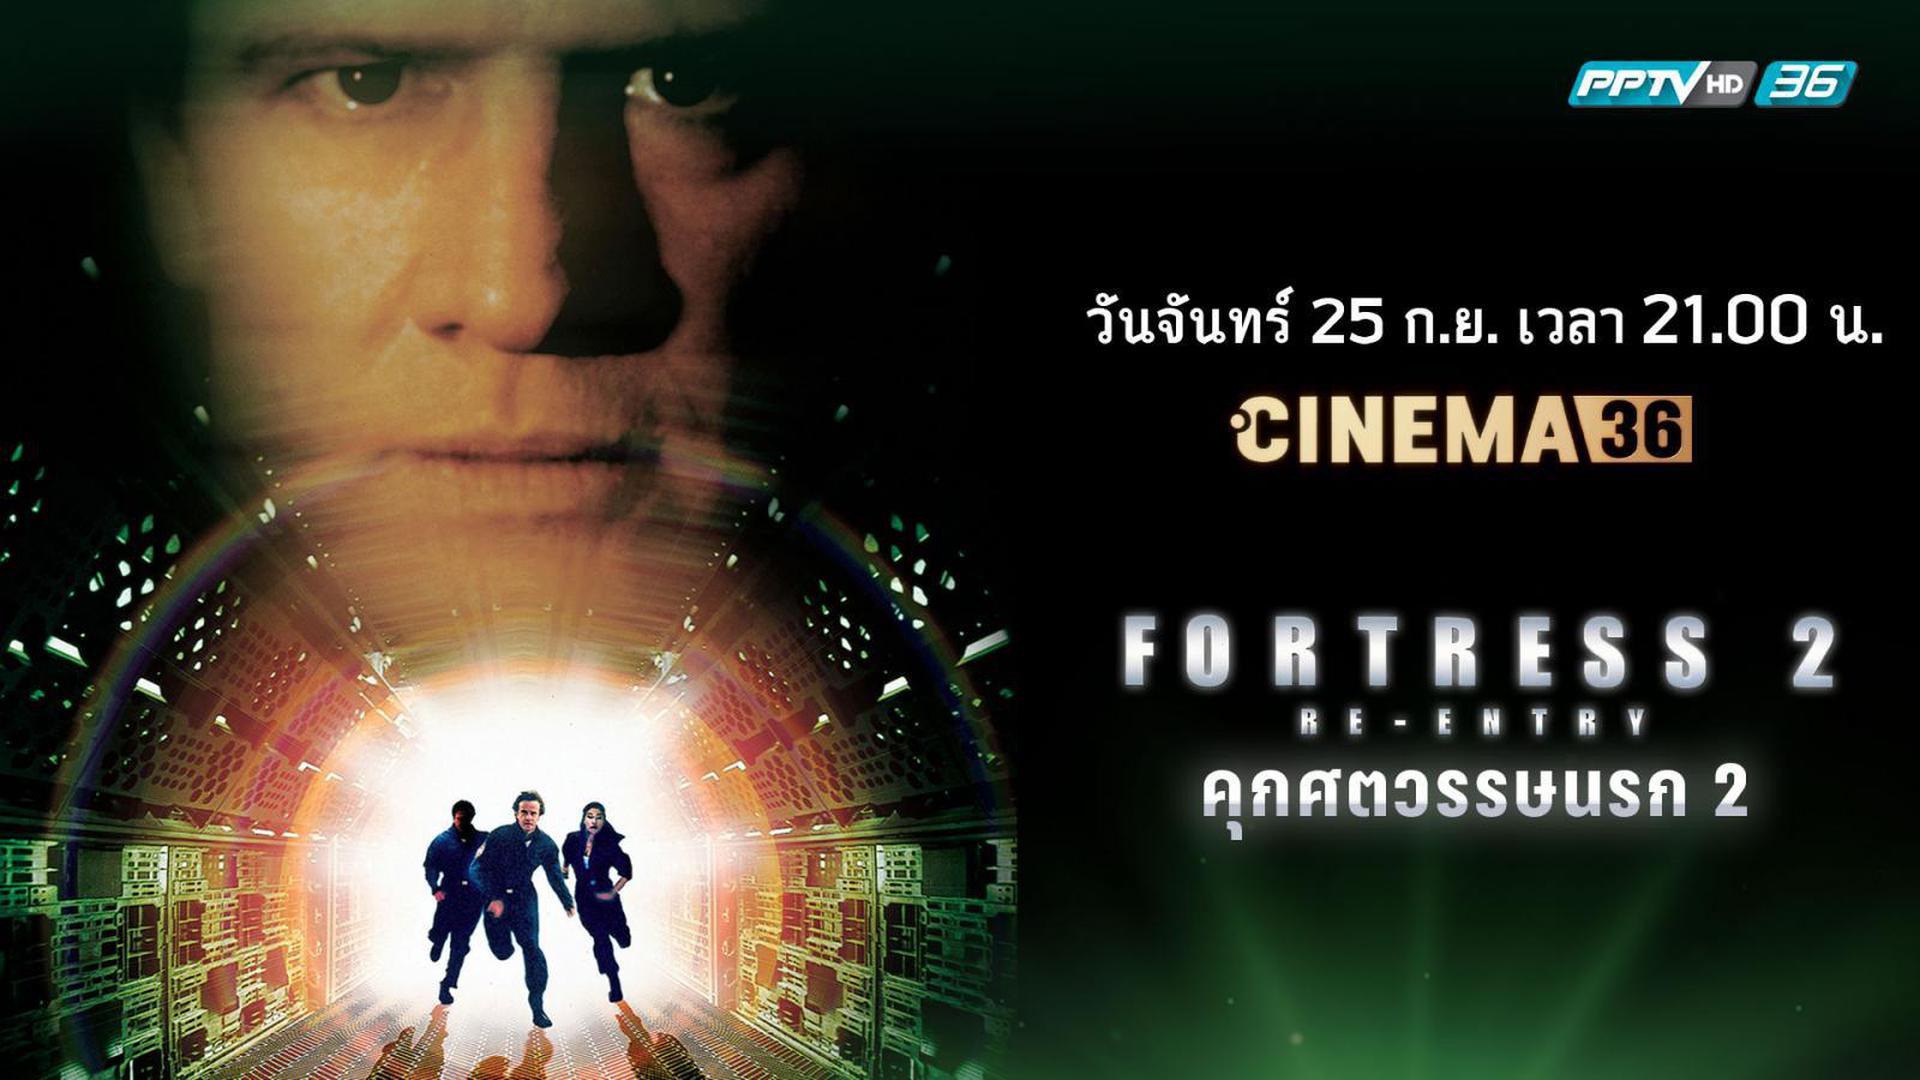 FORTRESS 2: RE-ENTRY คุกศตวรรษนรก 2